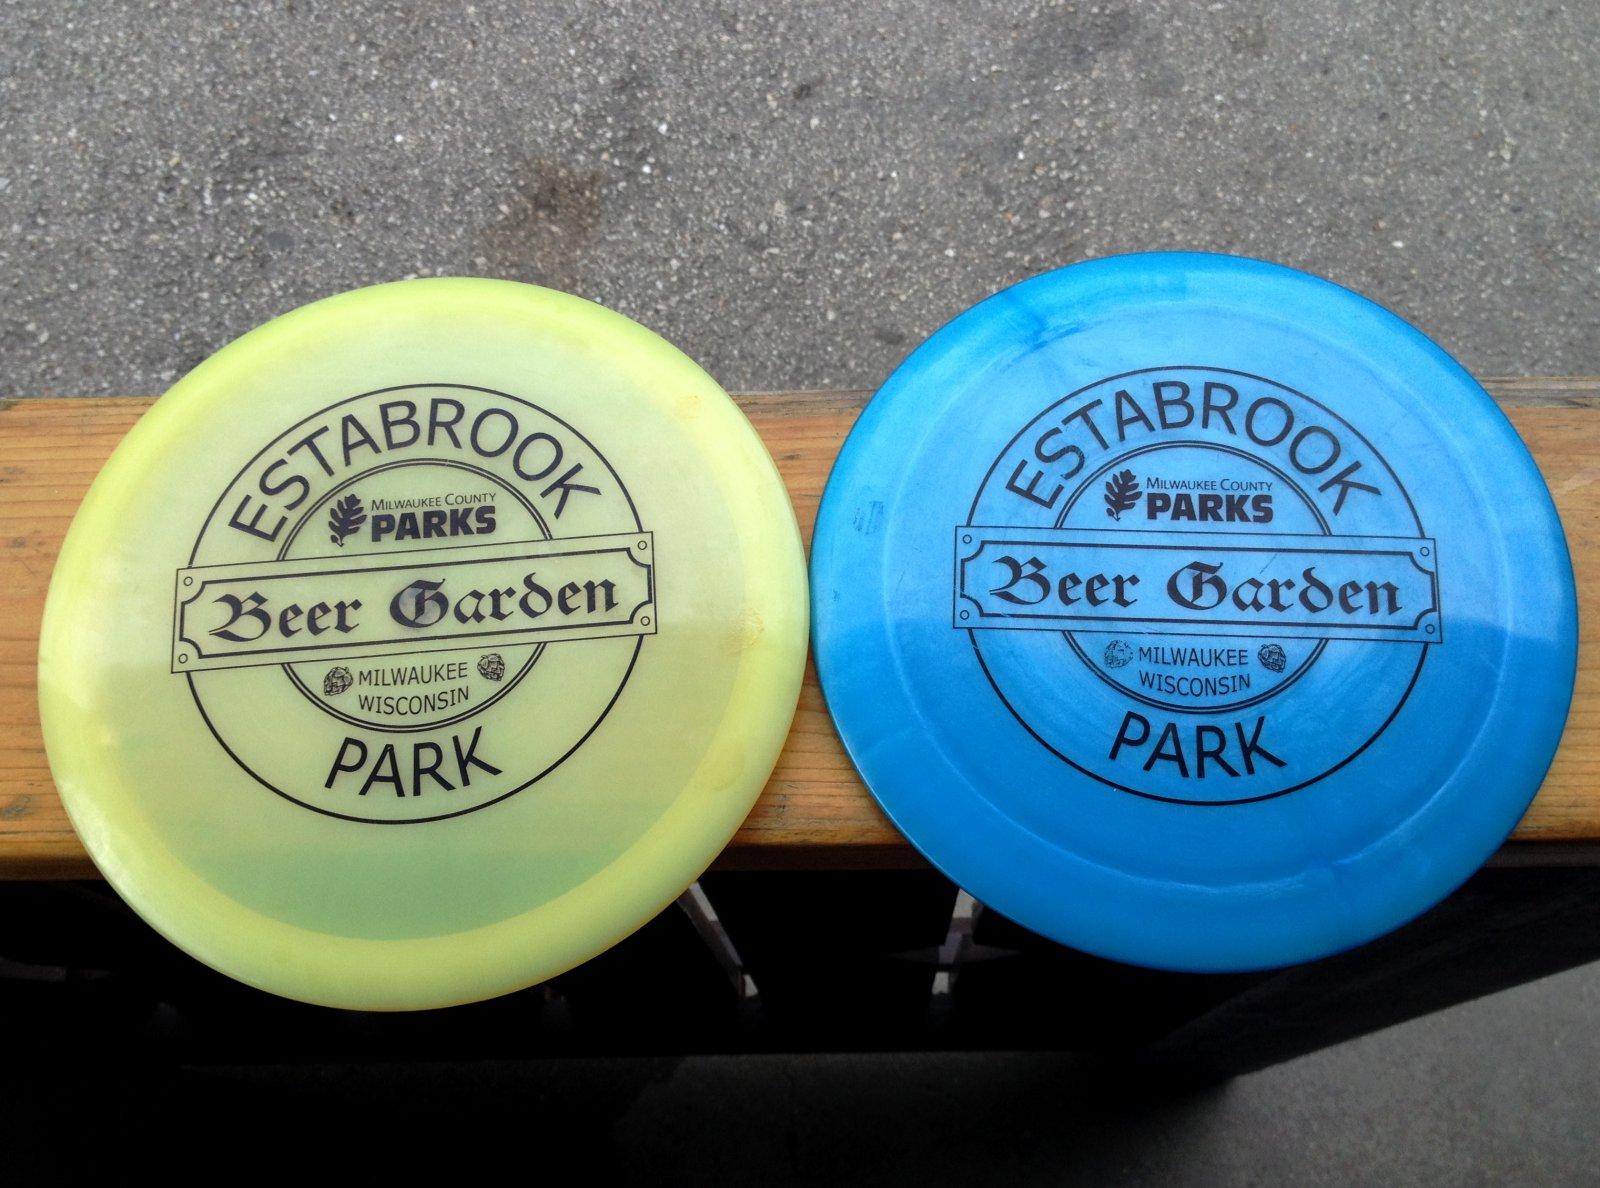 Estabrook Park Beer Garden